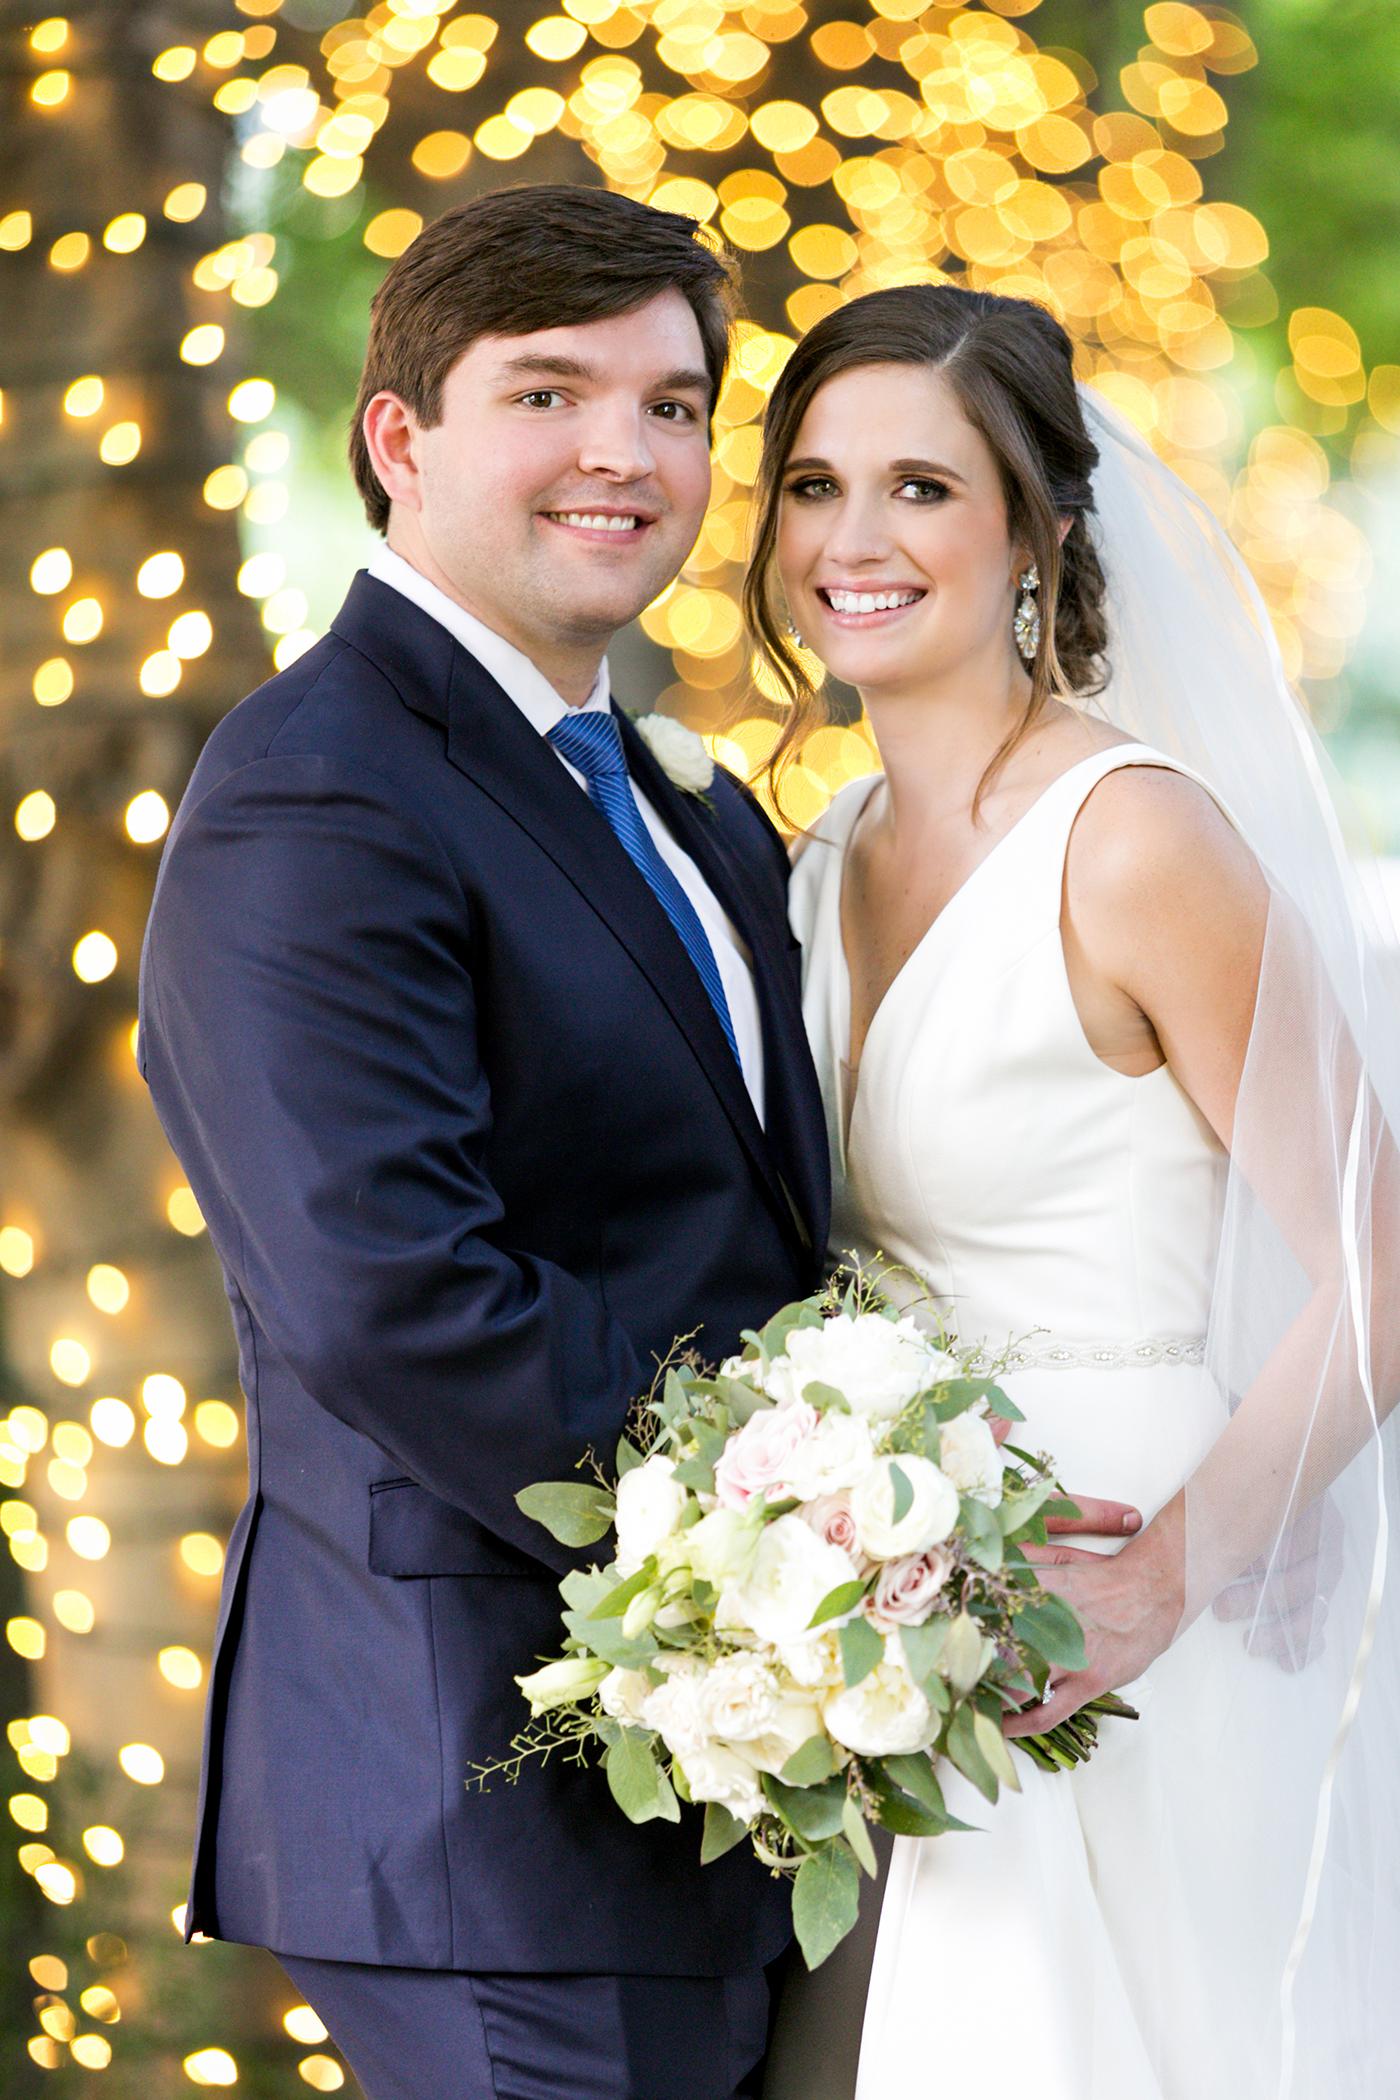 Wedding Planner Dallas TX - Allday Events - Highland Park - Marie Gabrielle Wedding - 277.jpg